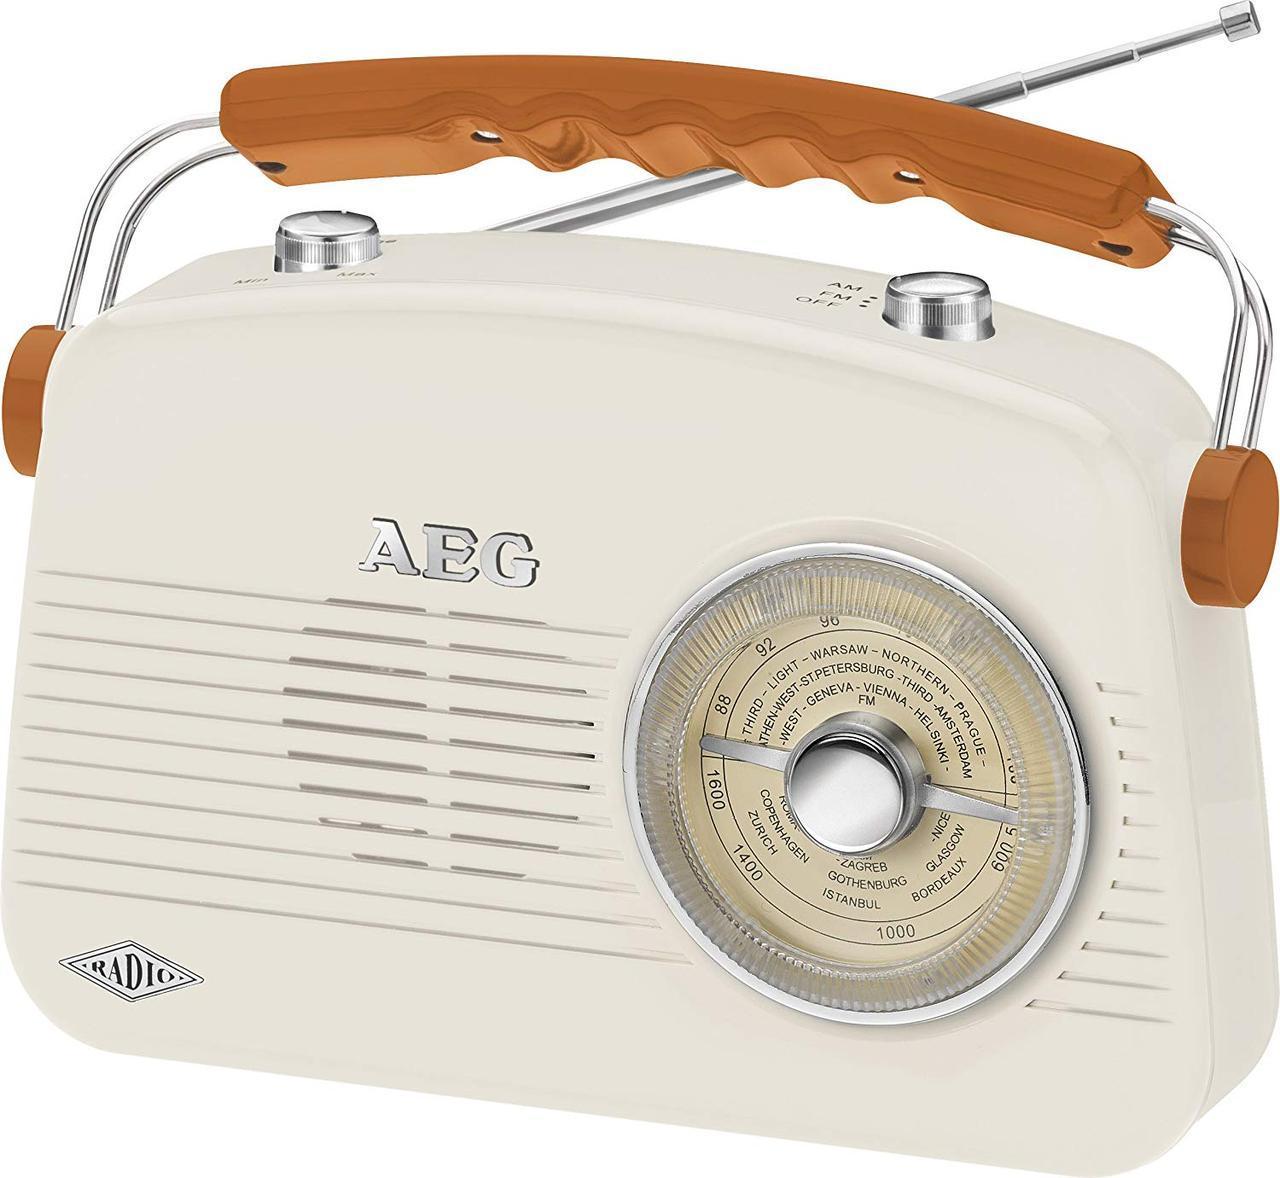 Радиоприемник AEG РЕТРО NR 4155